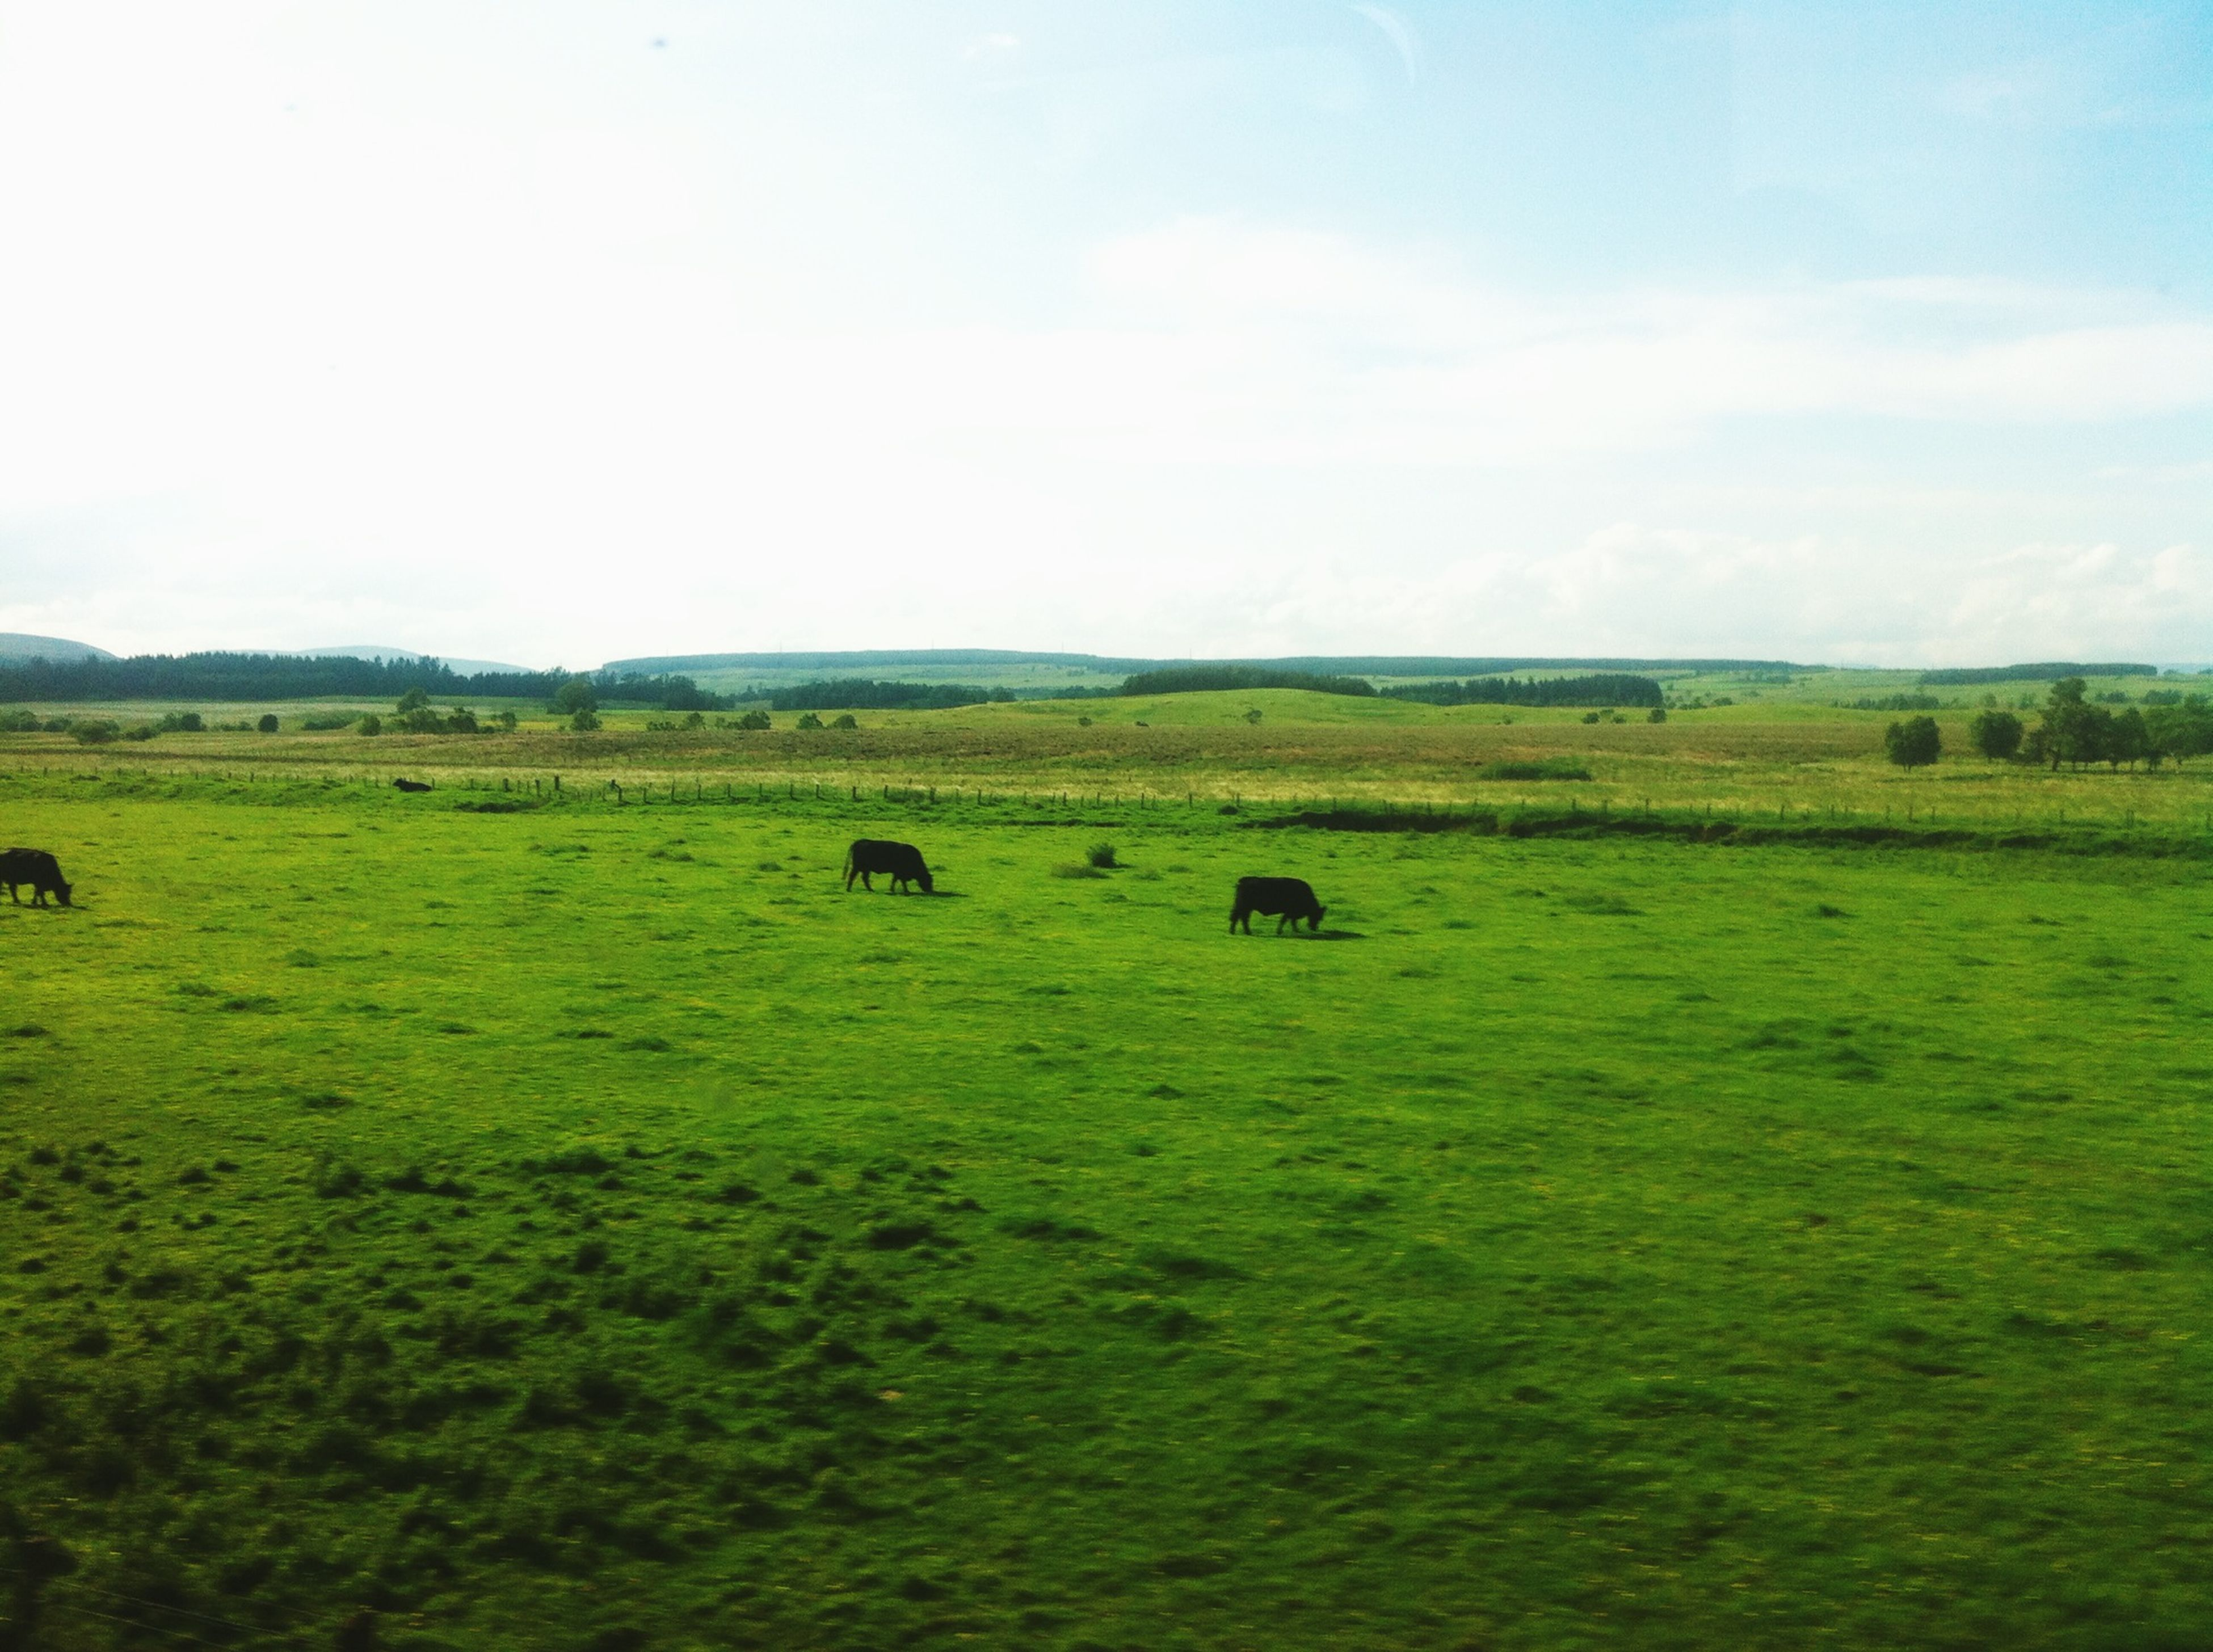 animal themes, grass, field, landscape, grazing, livestock, mammal, domestic animals, grassy, green color, nature, sky, tranquility, tranquil scene, rural scene, pasture, cow, beauty in nature, scenics